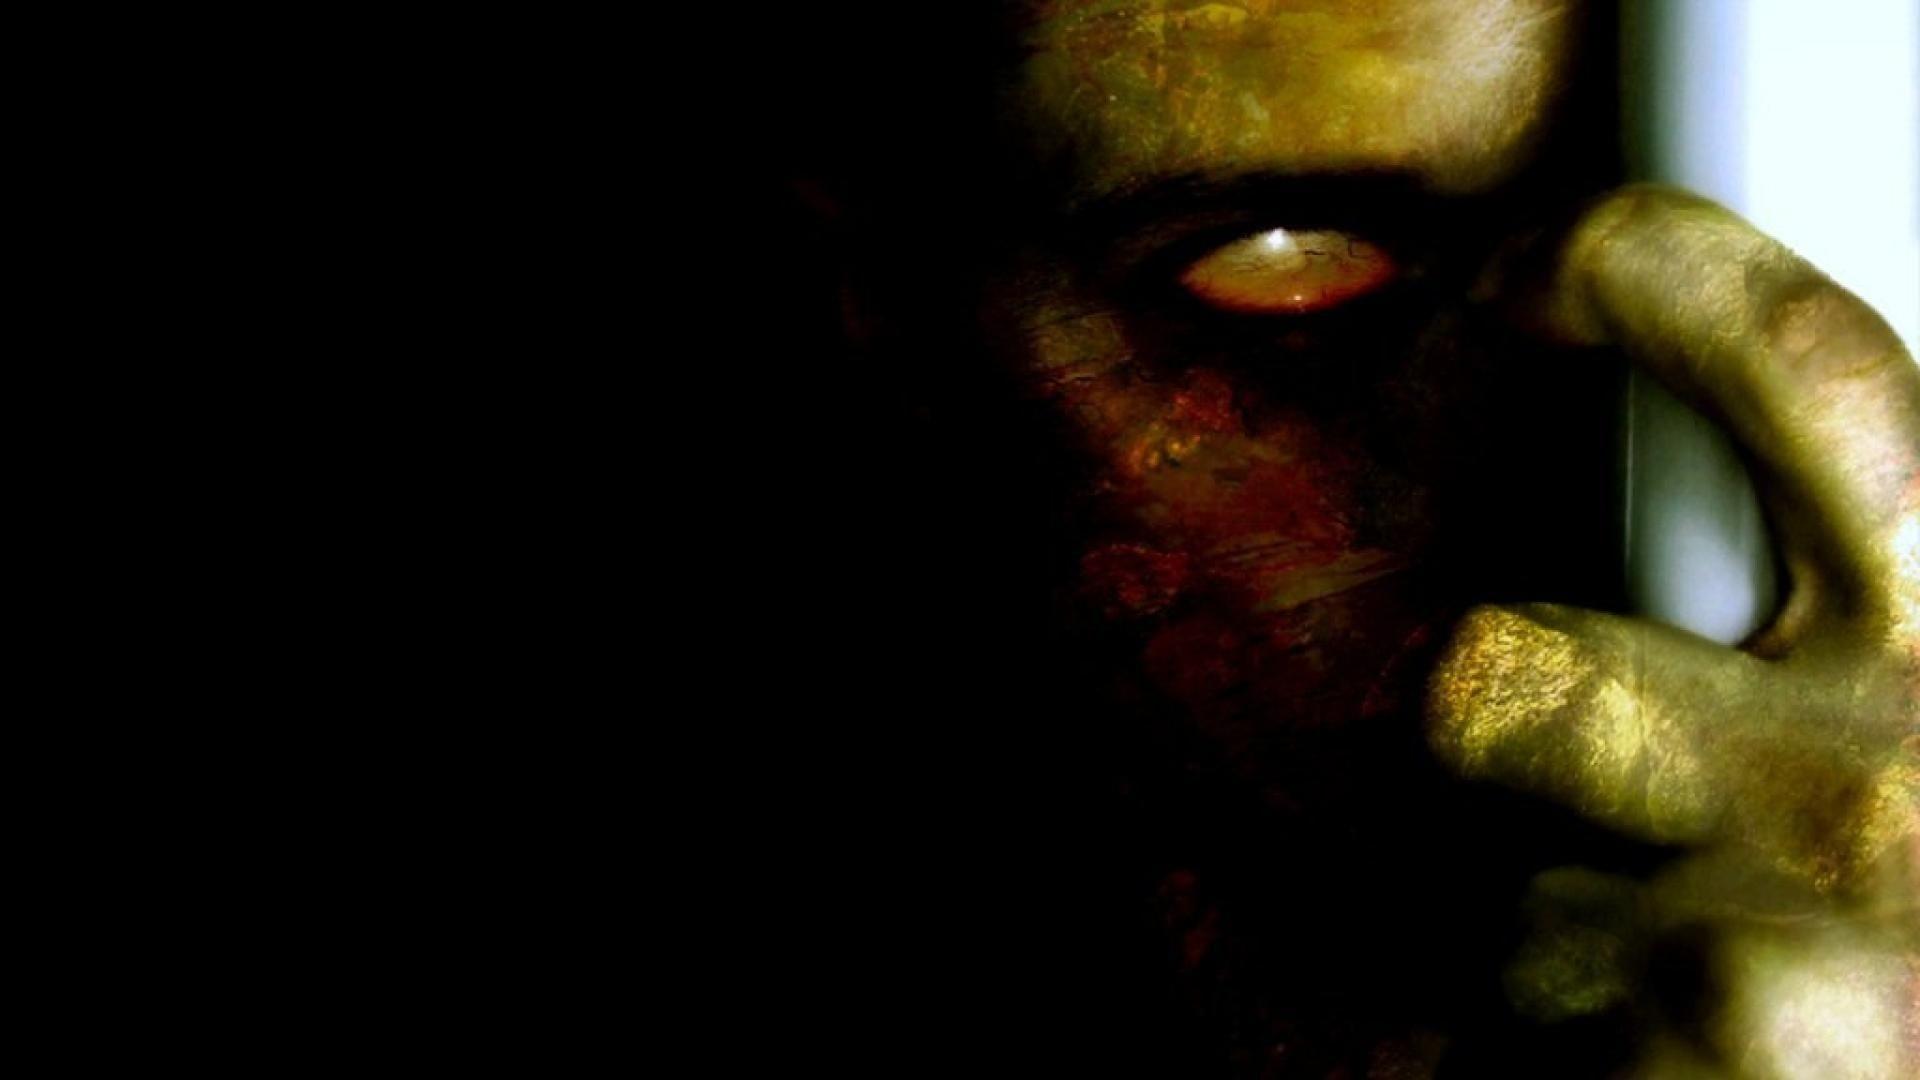 Res: 1920x1080, zombie shadowed horror fantasy scary art hd wallpaper - (#22860 .